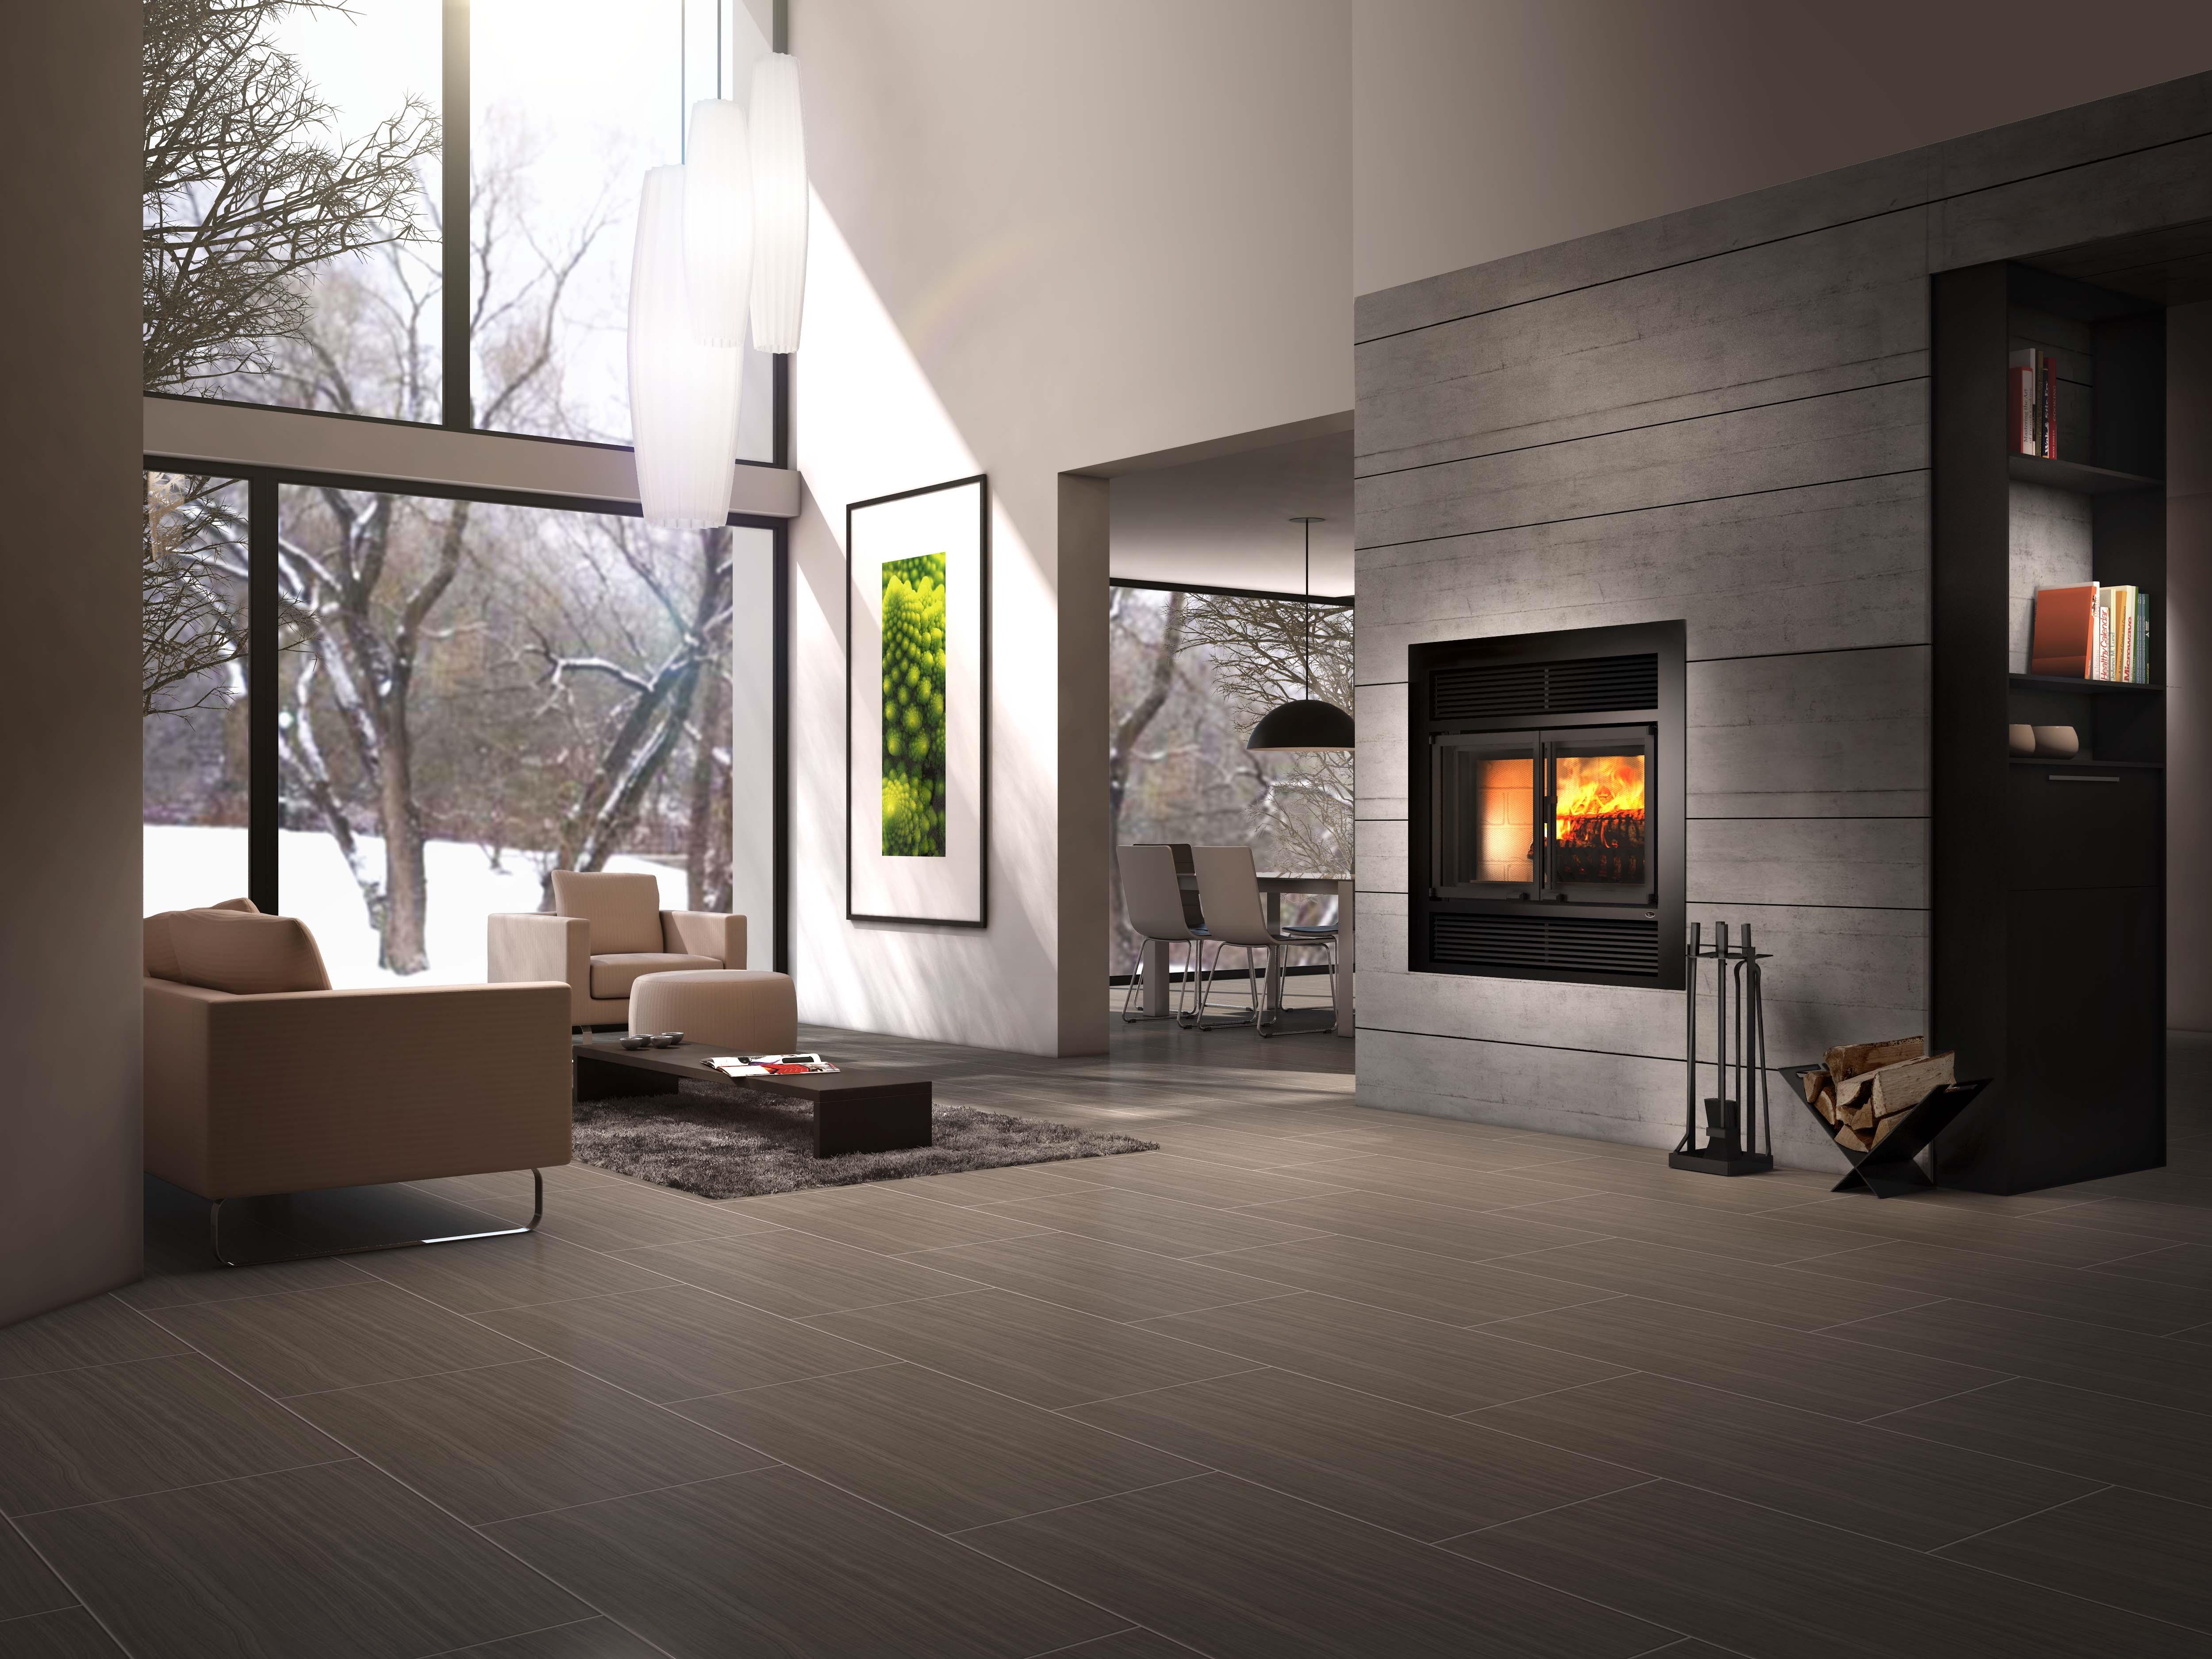 Home Et Foyer Avis : Fp s beaumont foyers d ambiance valcourt